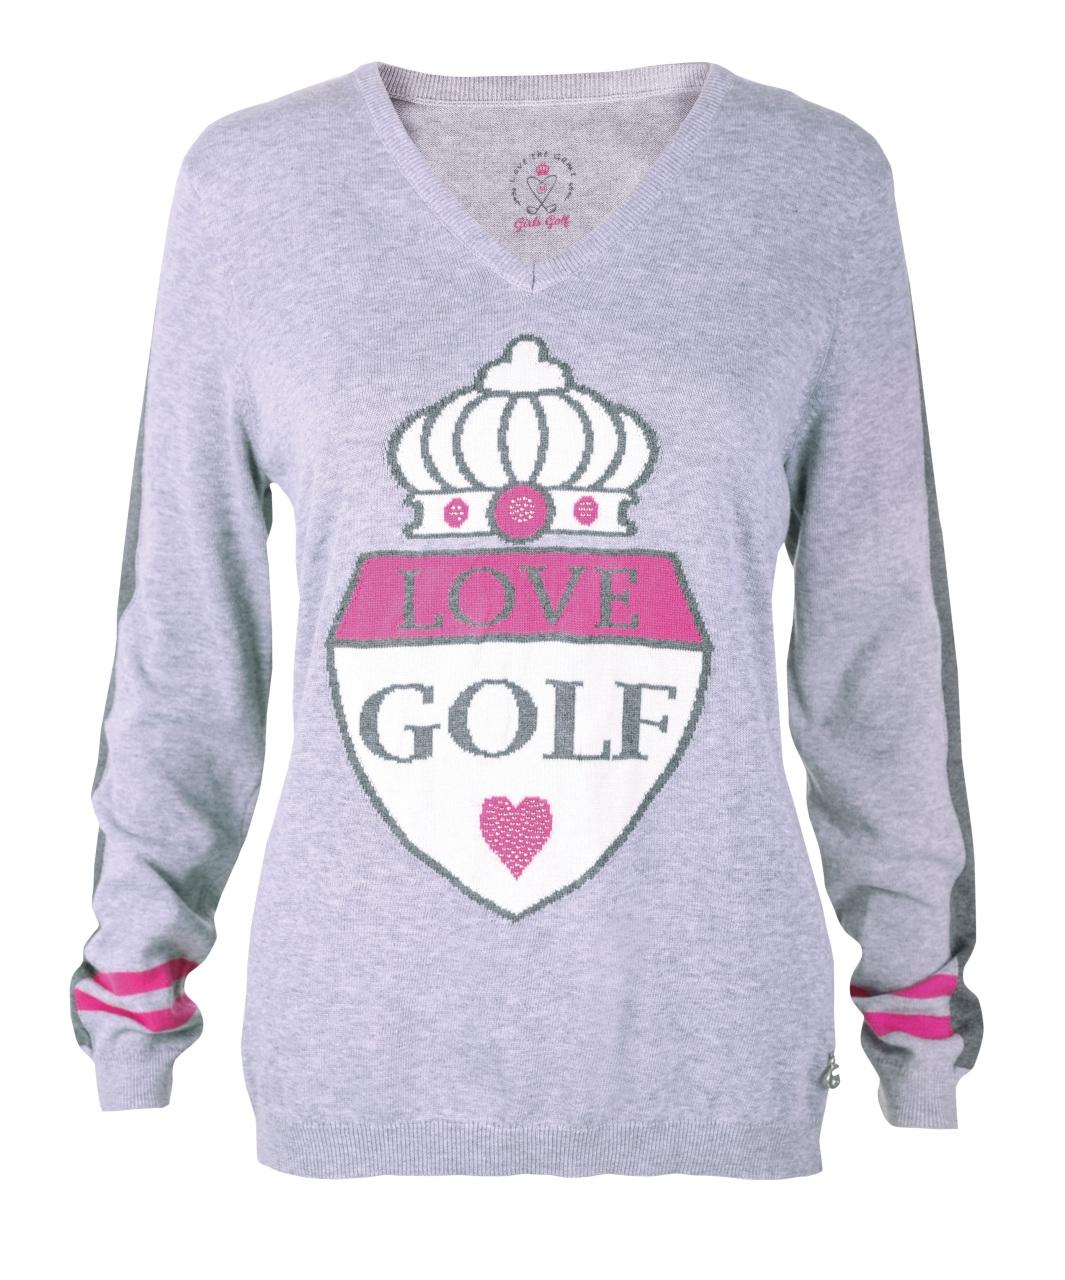 girls golf Damen V-neck knitted golf sweater GIANT CREST 19922 grau